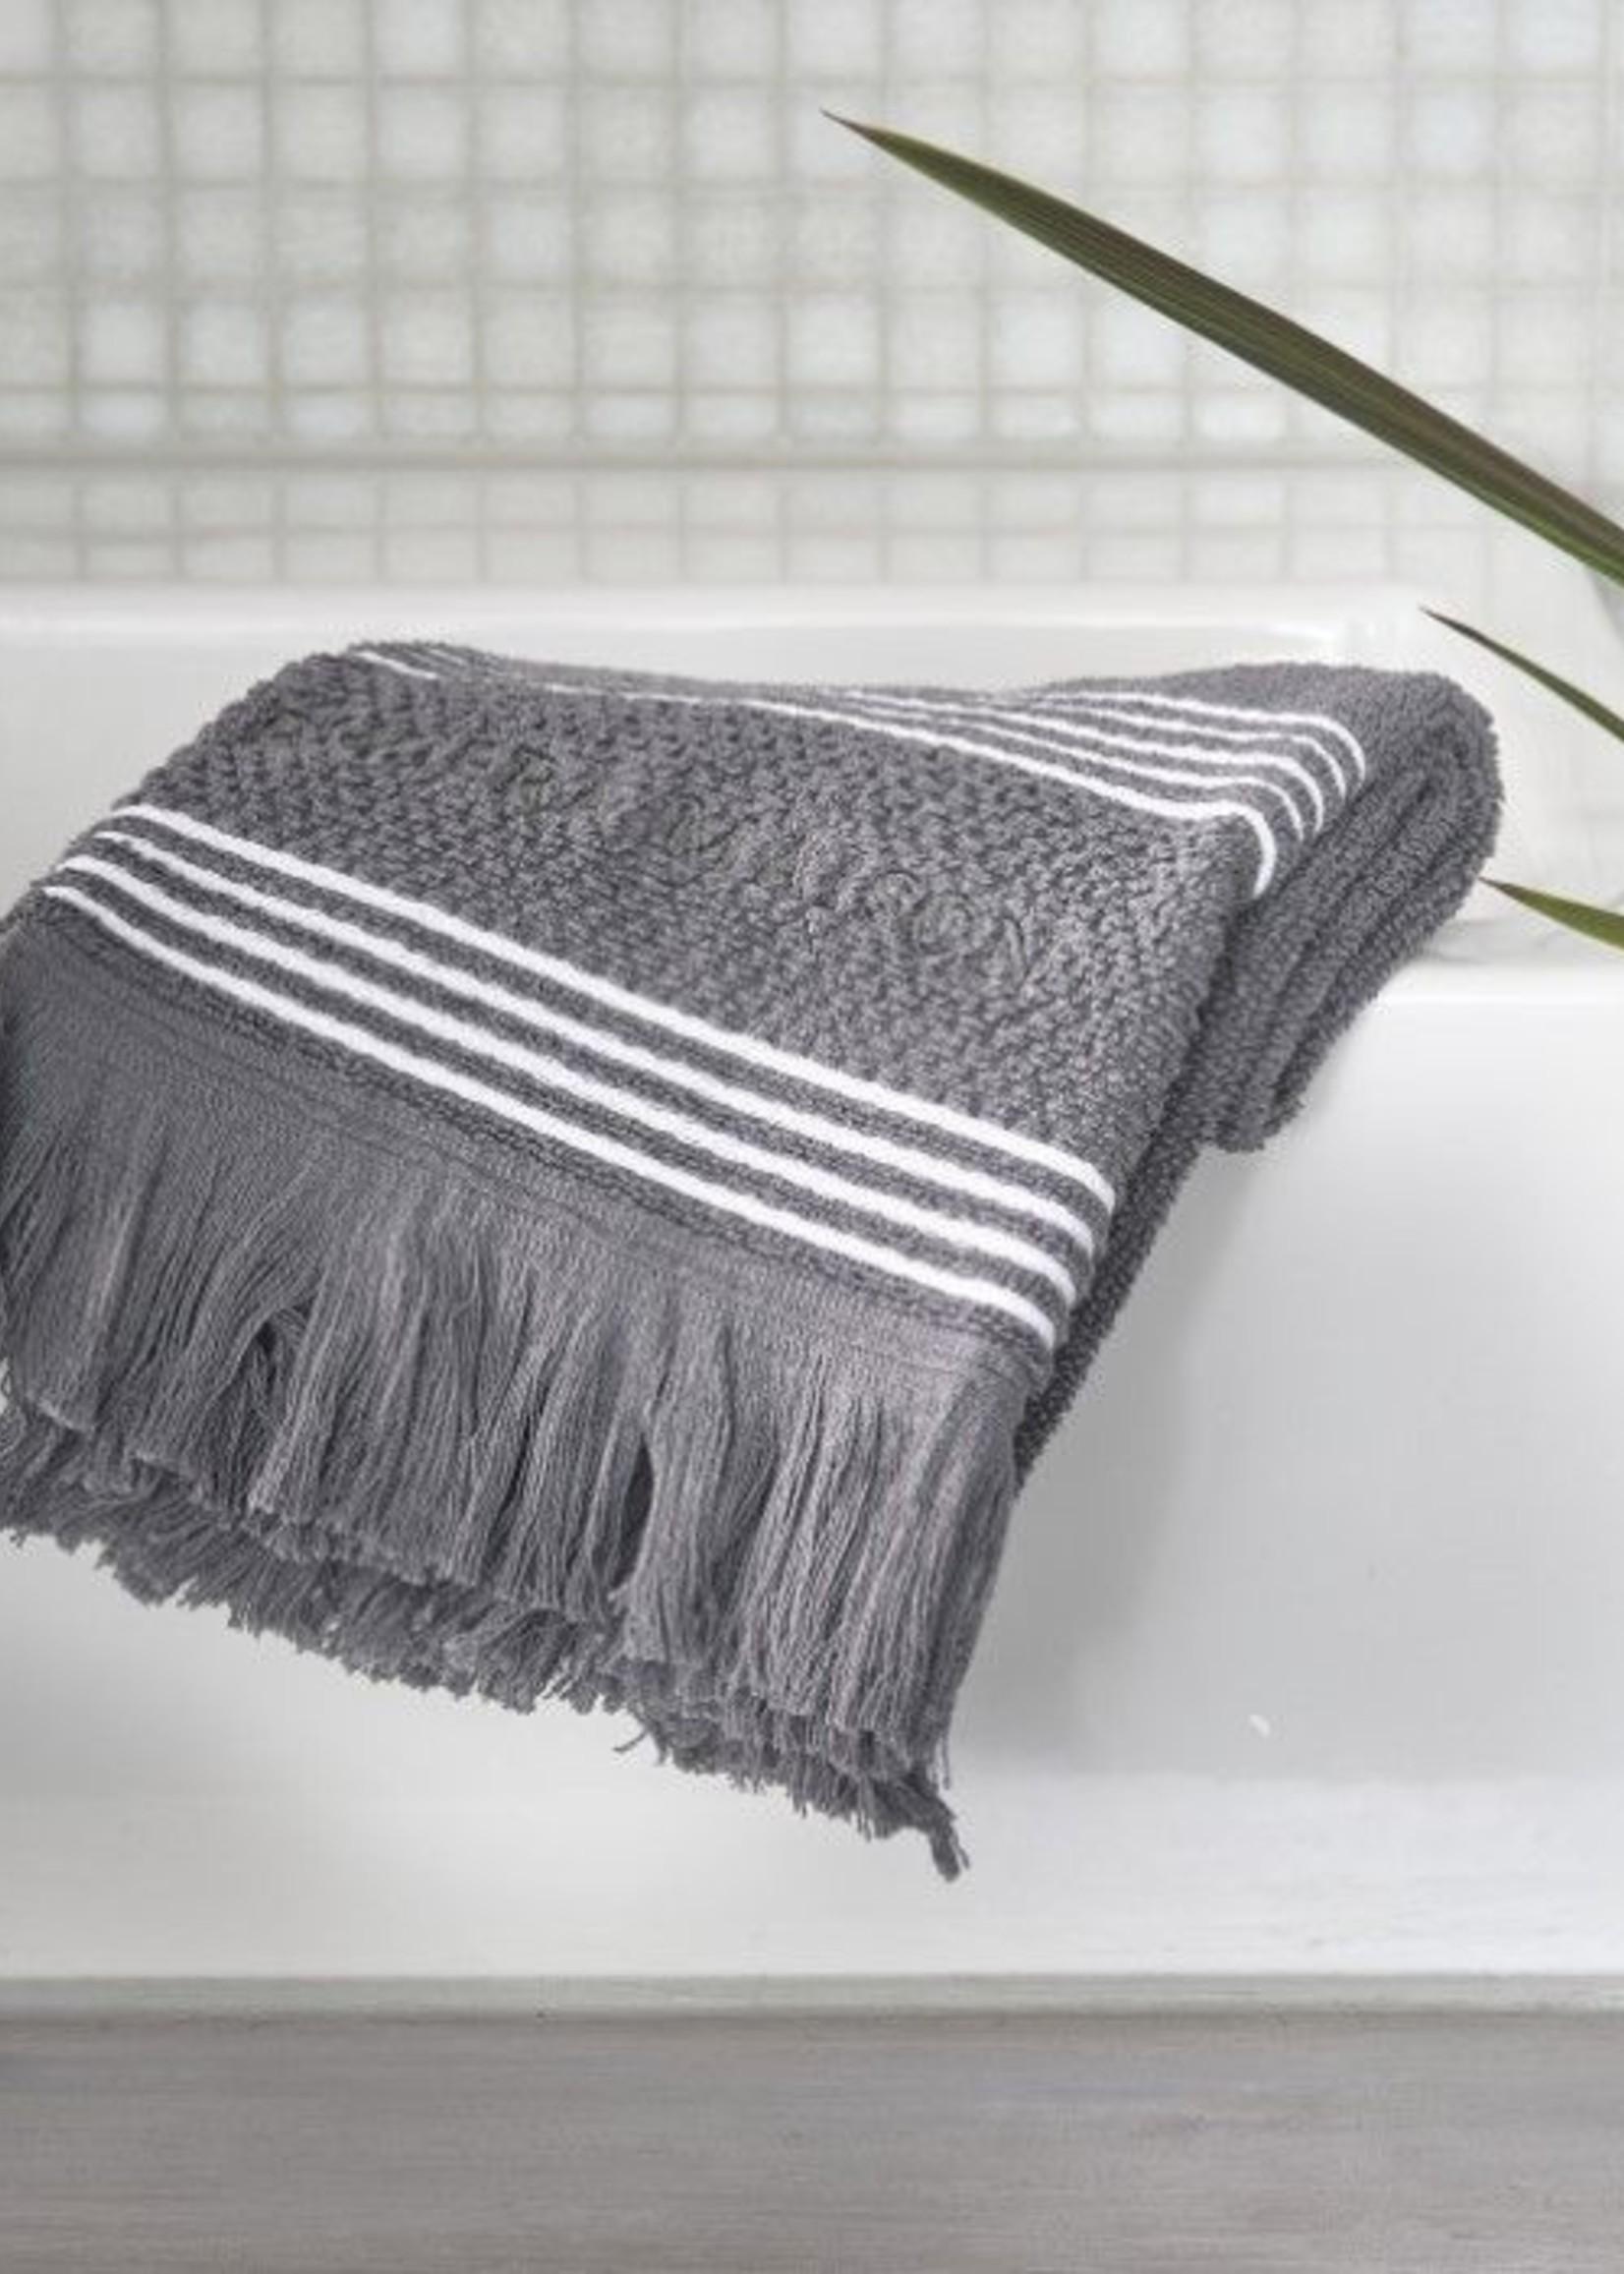 Riviera Maison Serene Guest Towel anthracite 50x30